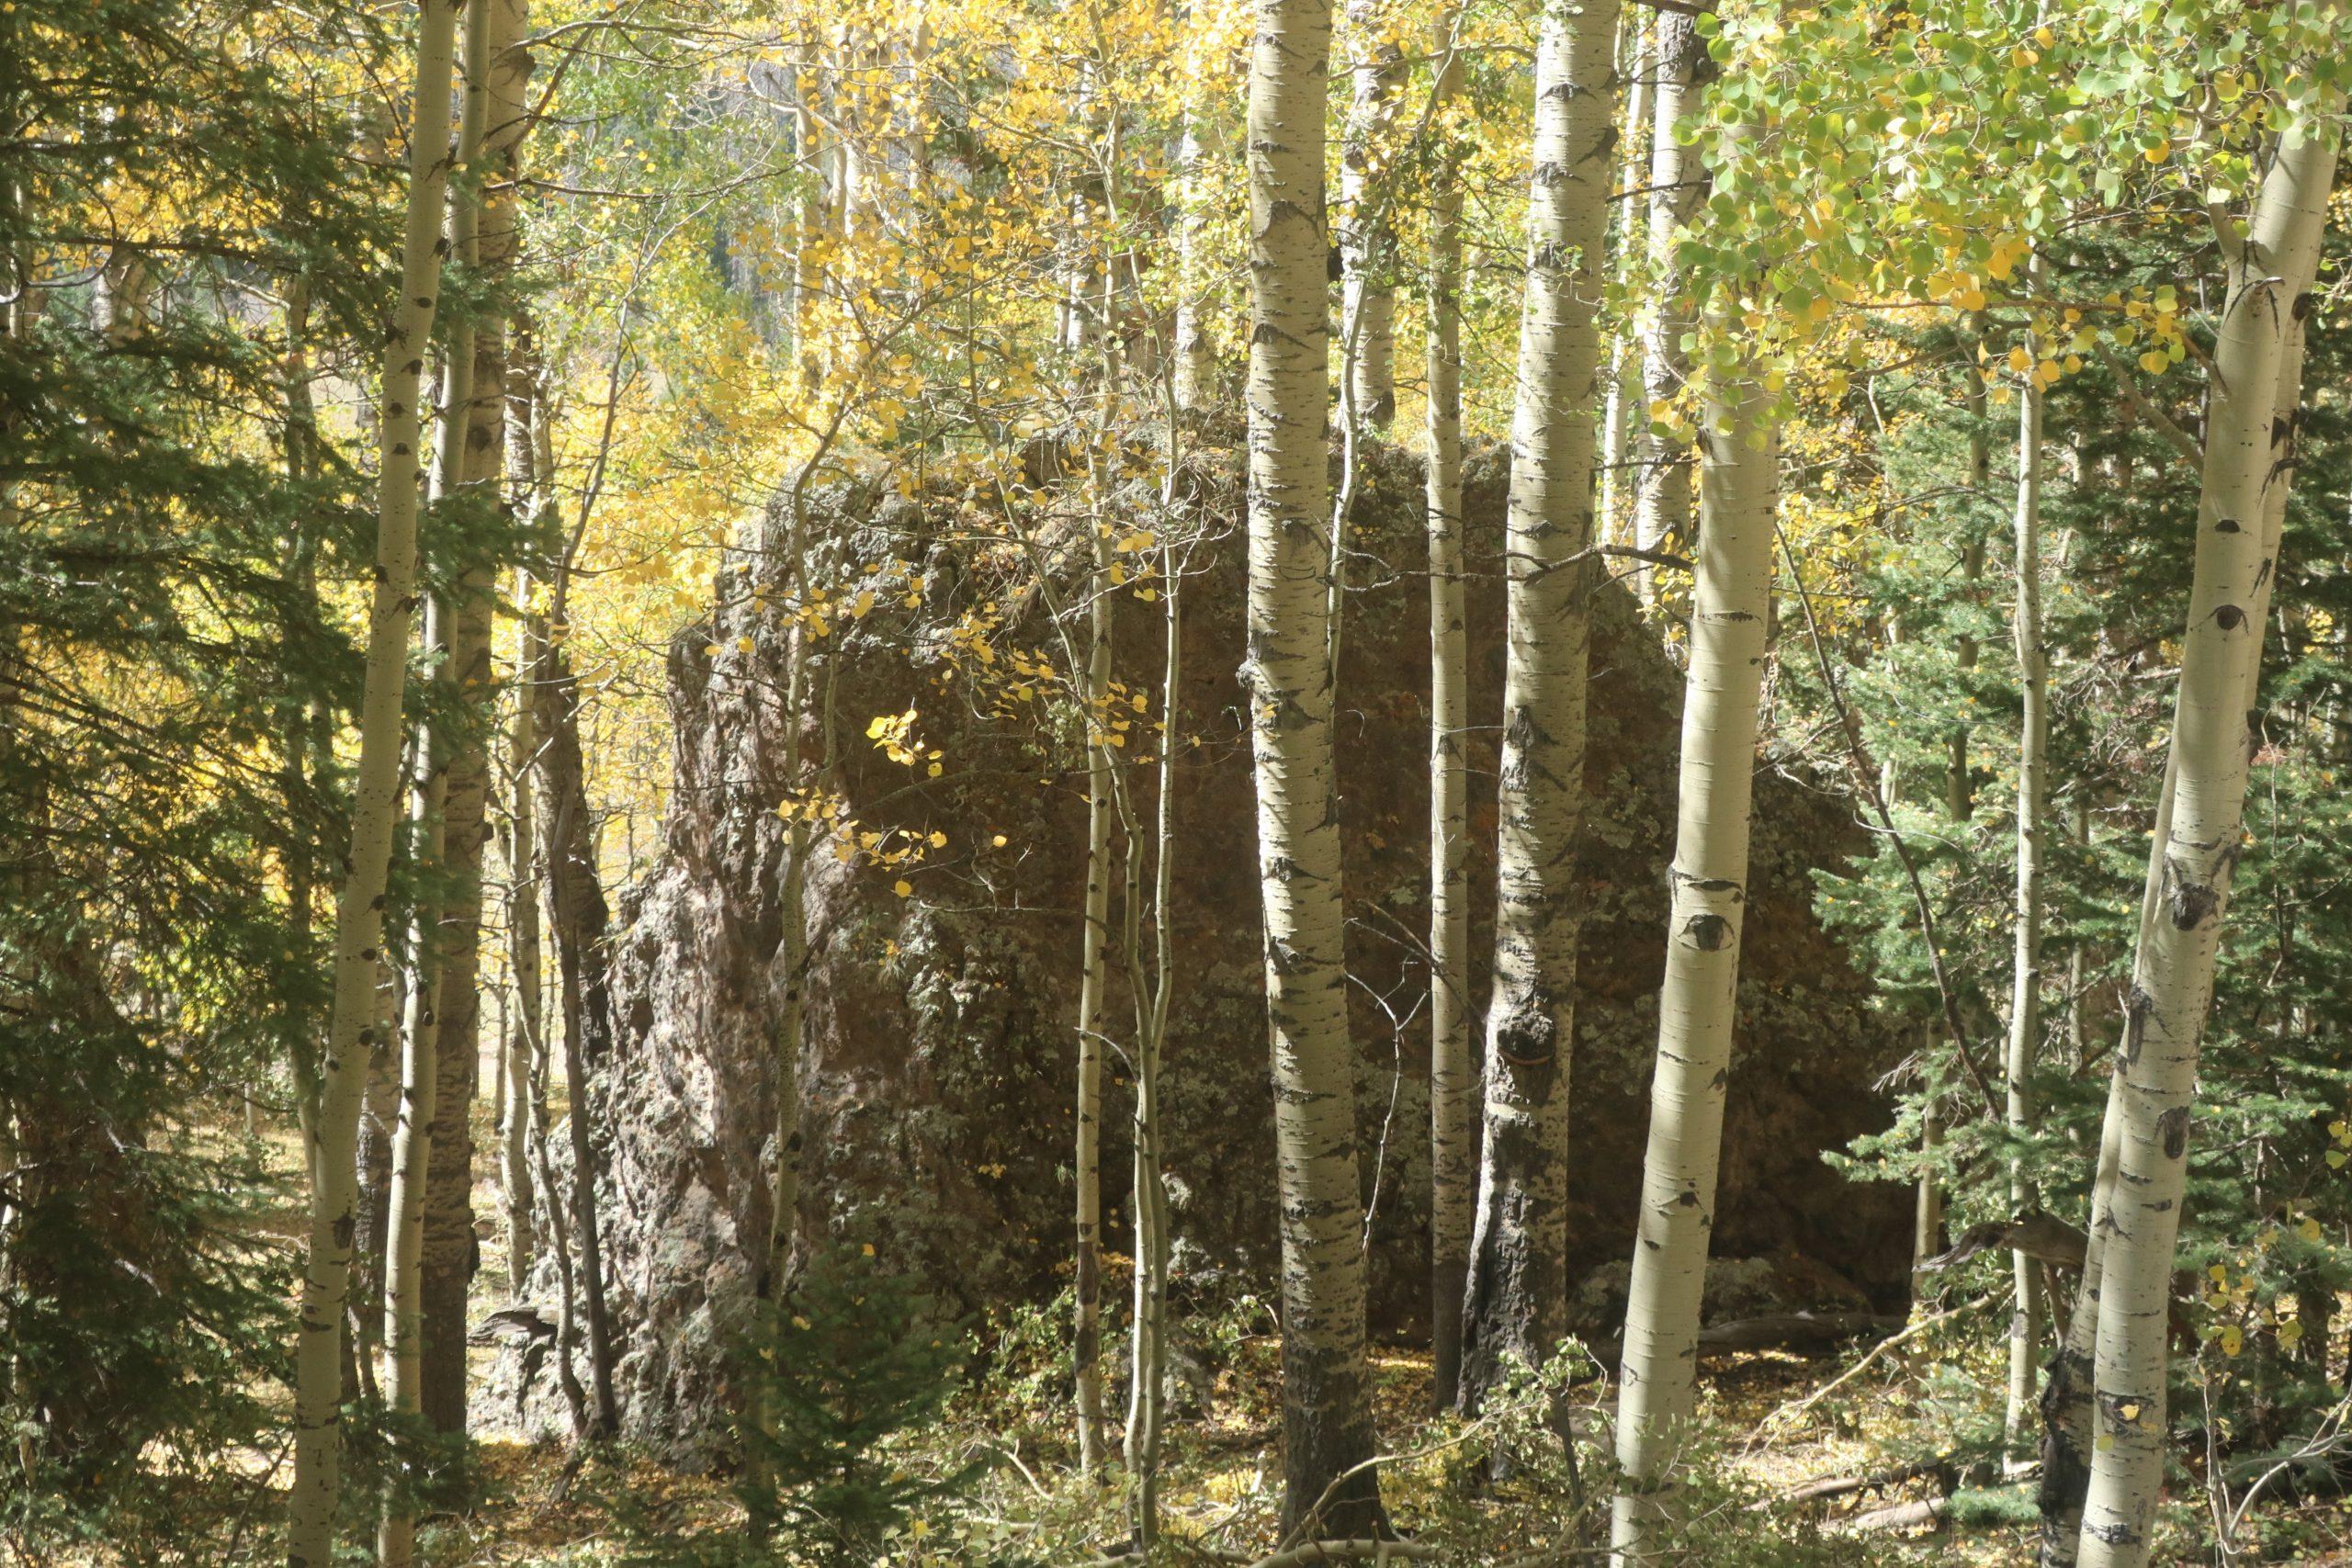 Large rock in aspen forest